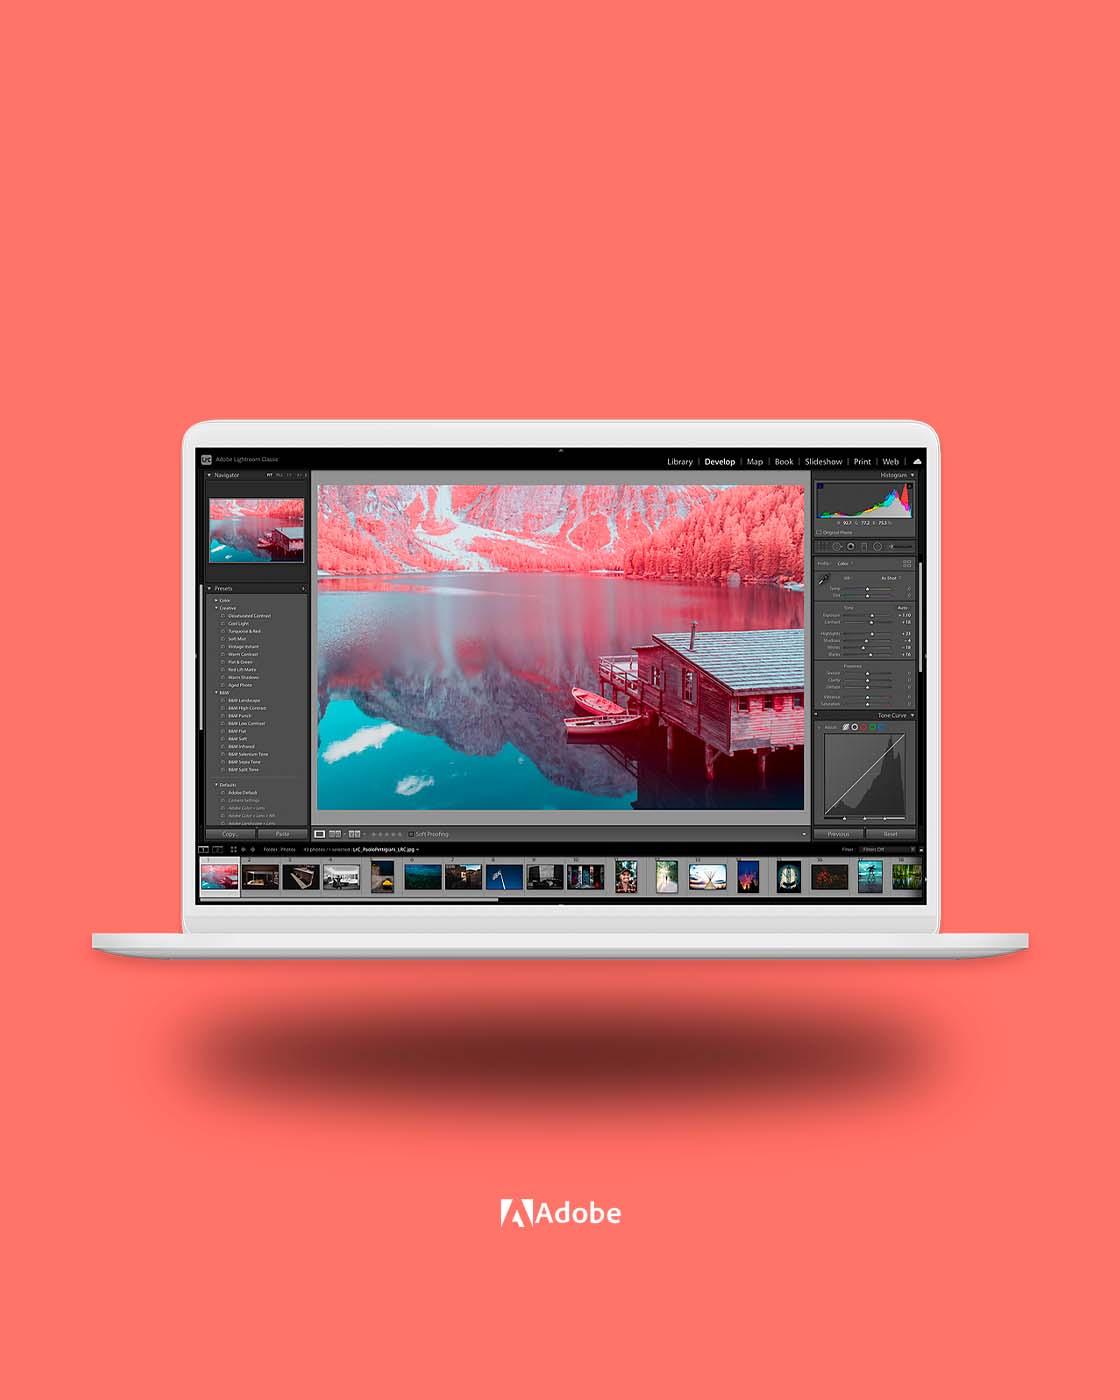 5.2_Lightroom Splash Screen_Visual